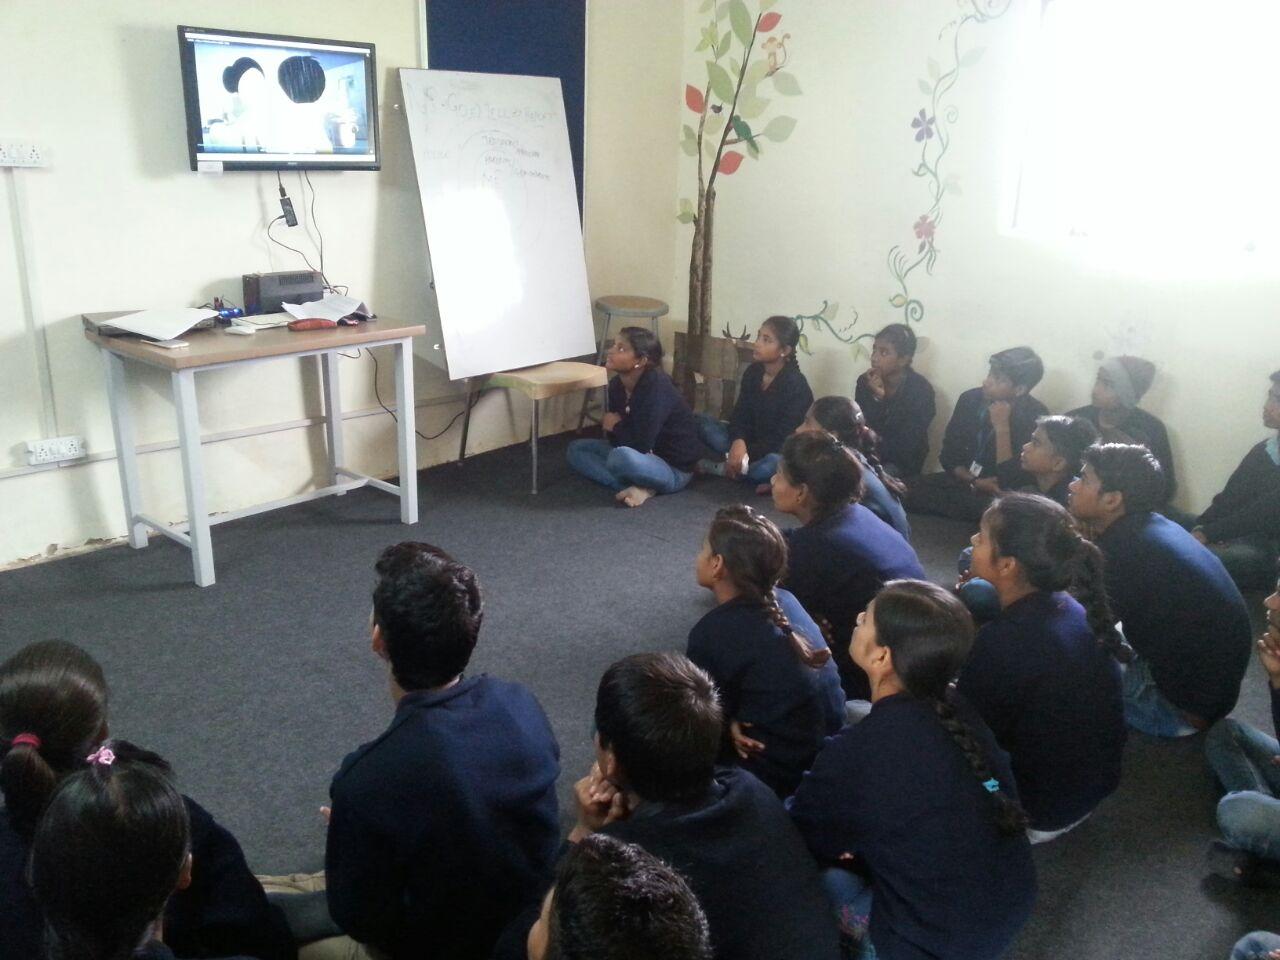 Teaching via Audio Visual